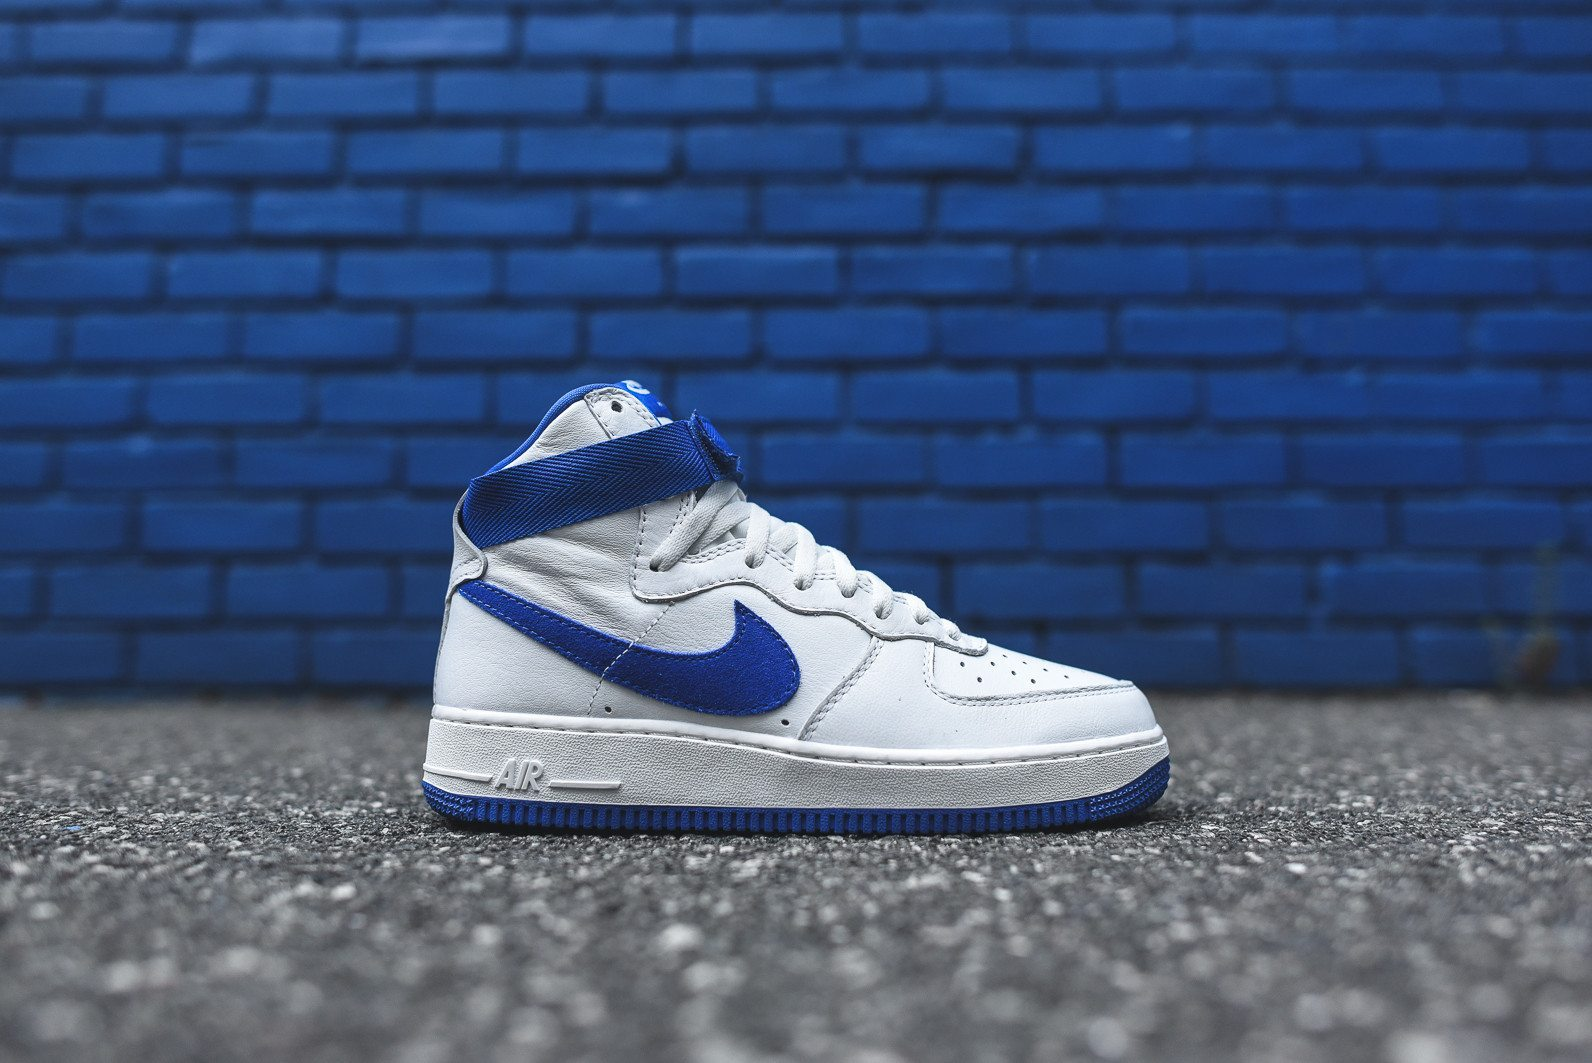 Nike Air Force 1 Hi Retro White Game Royal 2